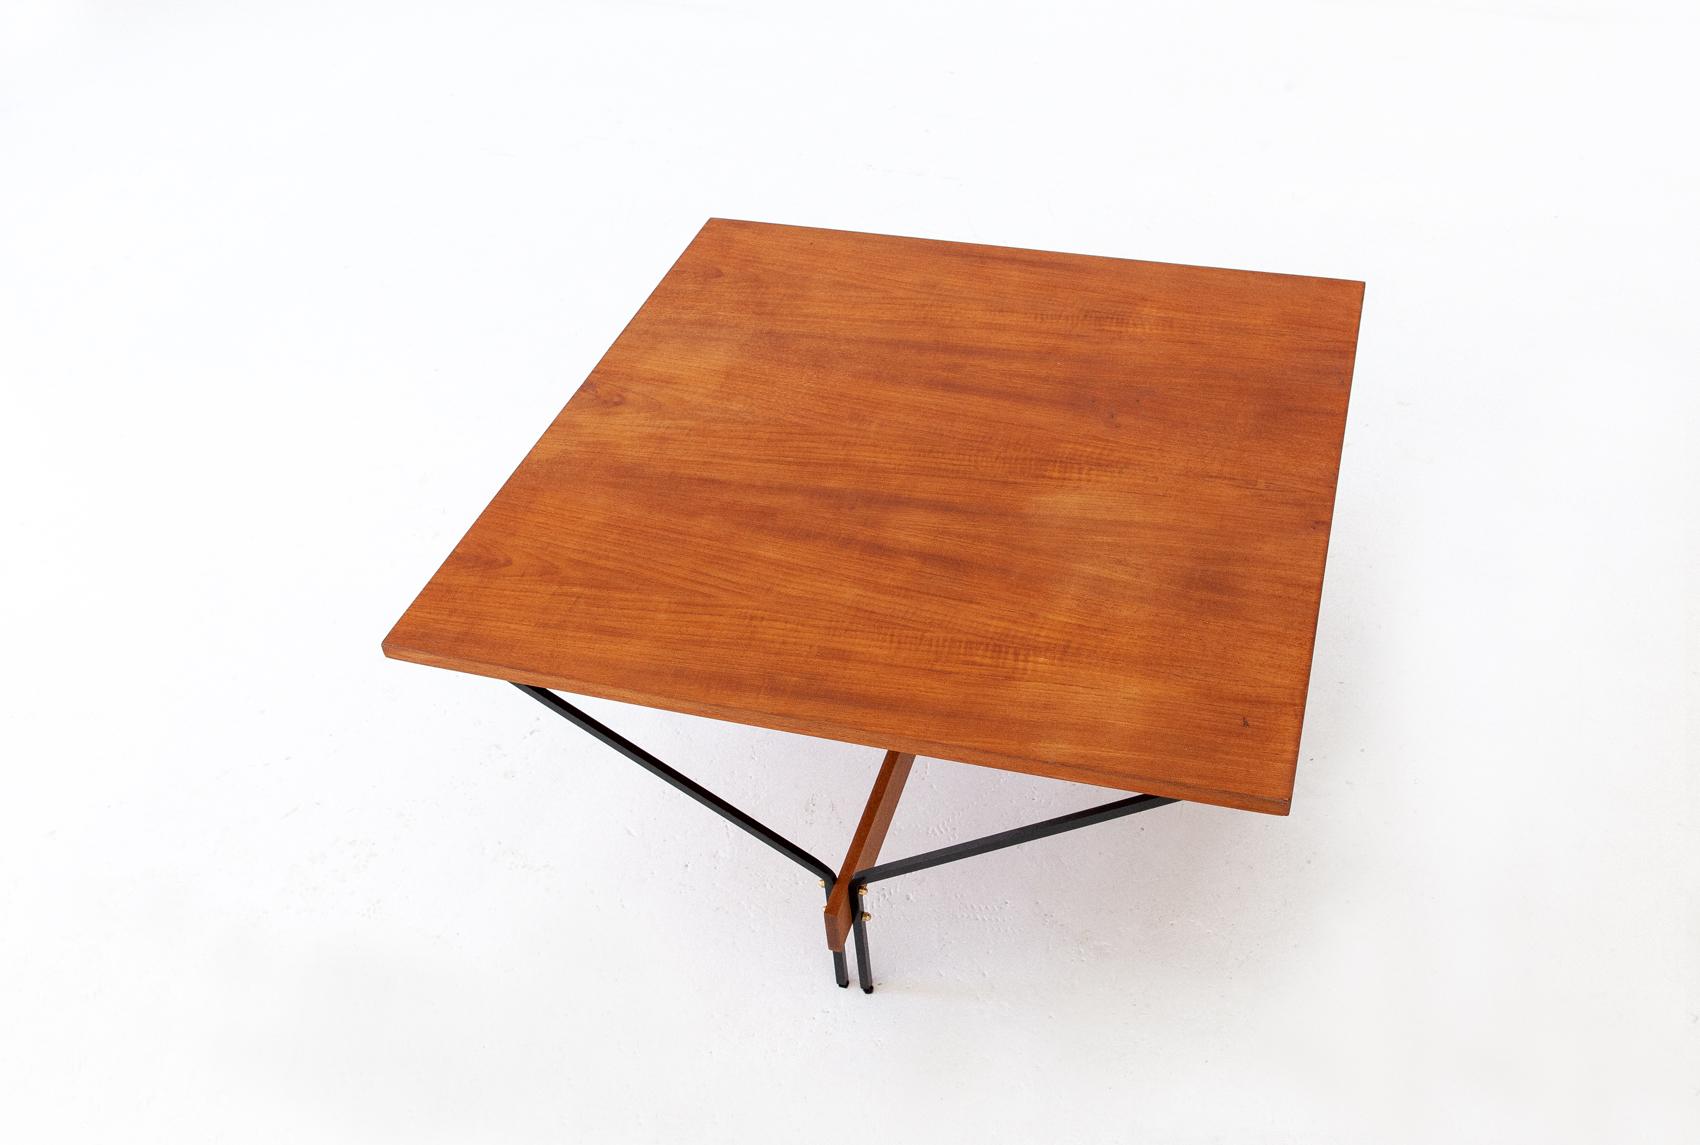 T78-retro4m-teak-black-iron-square-cofee-table-1-3